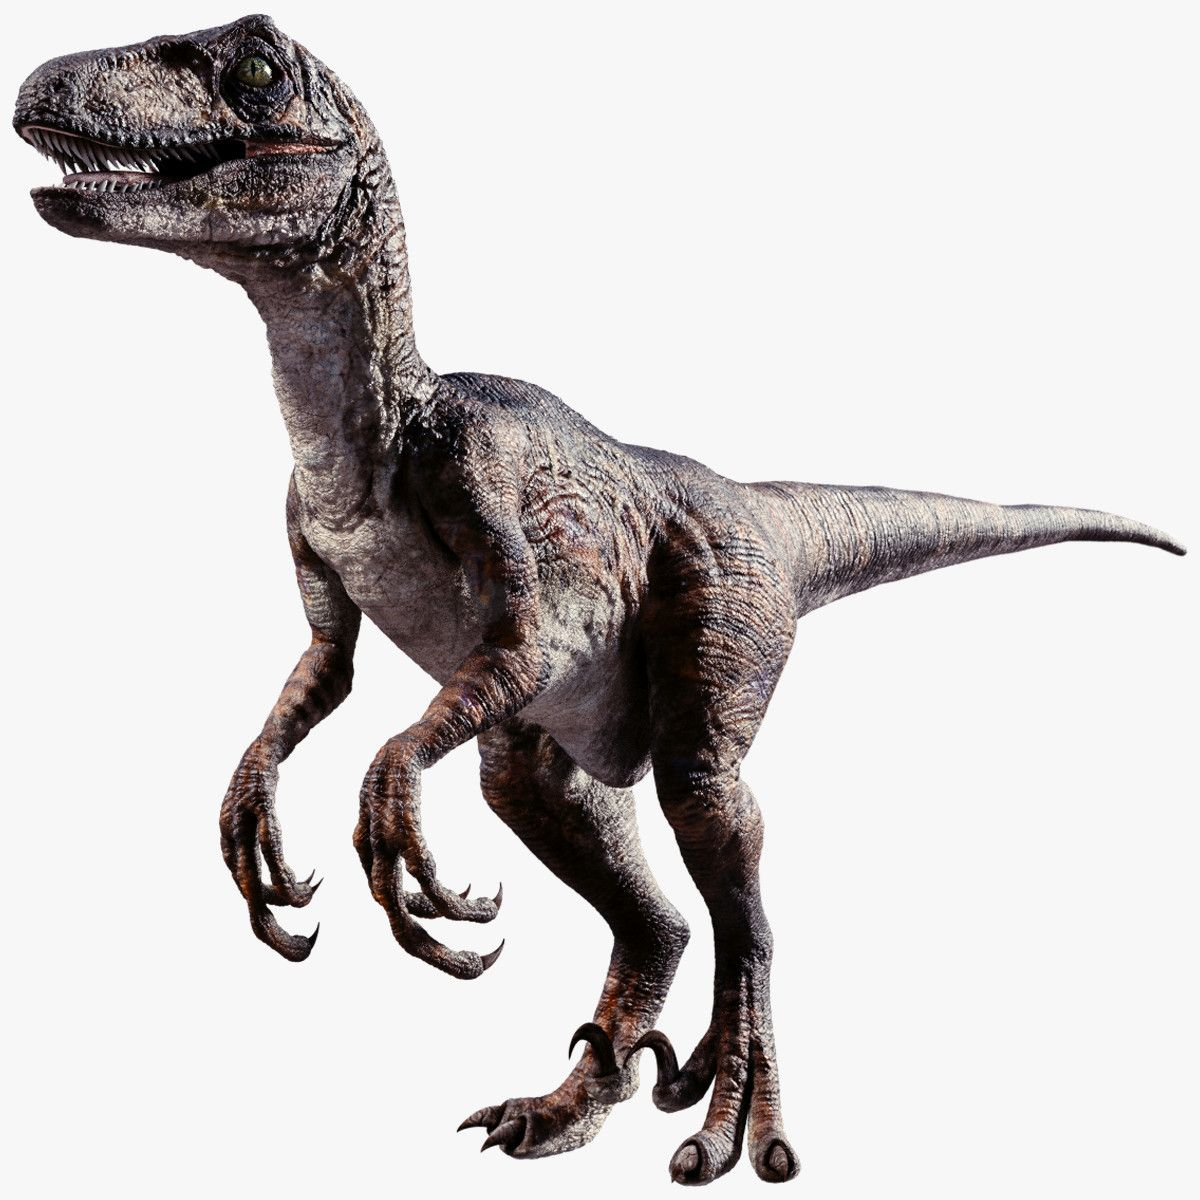 Raptor Dinosaur 3d Obj Raptor Dinosaur Dinosaur Pictures Dinosaur